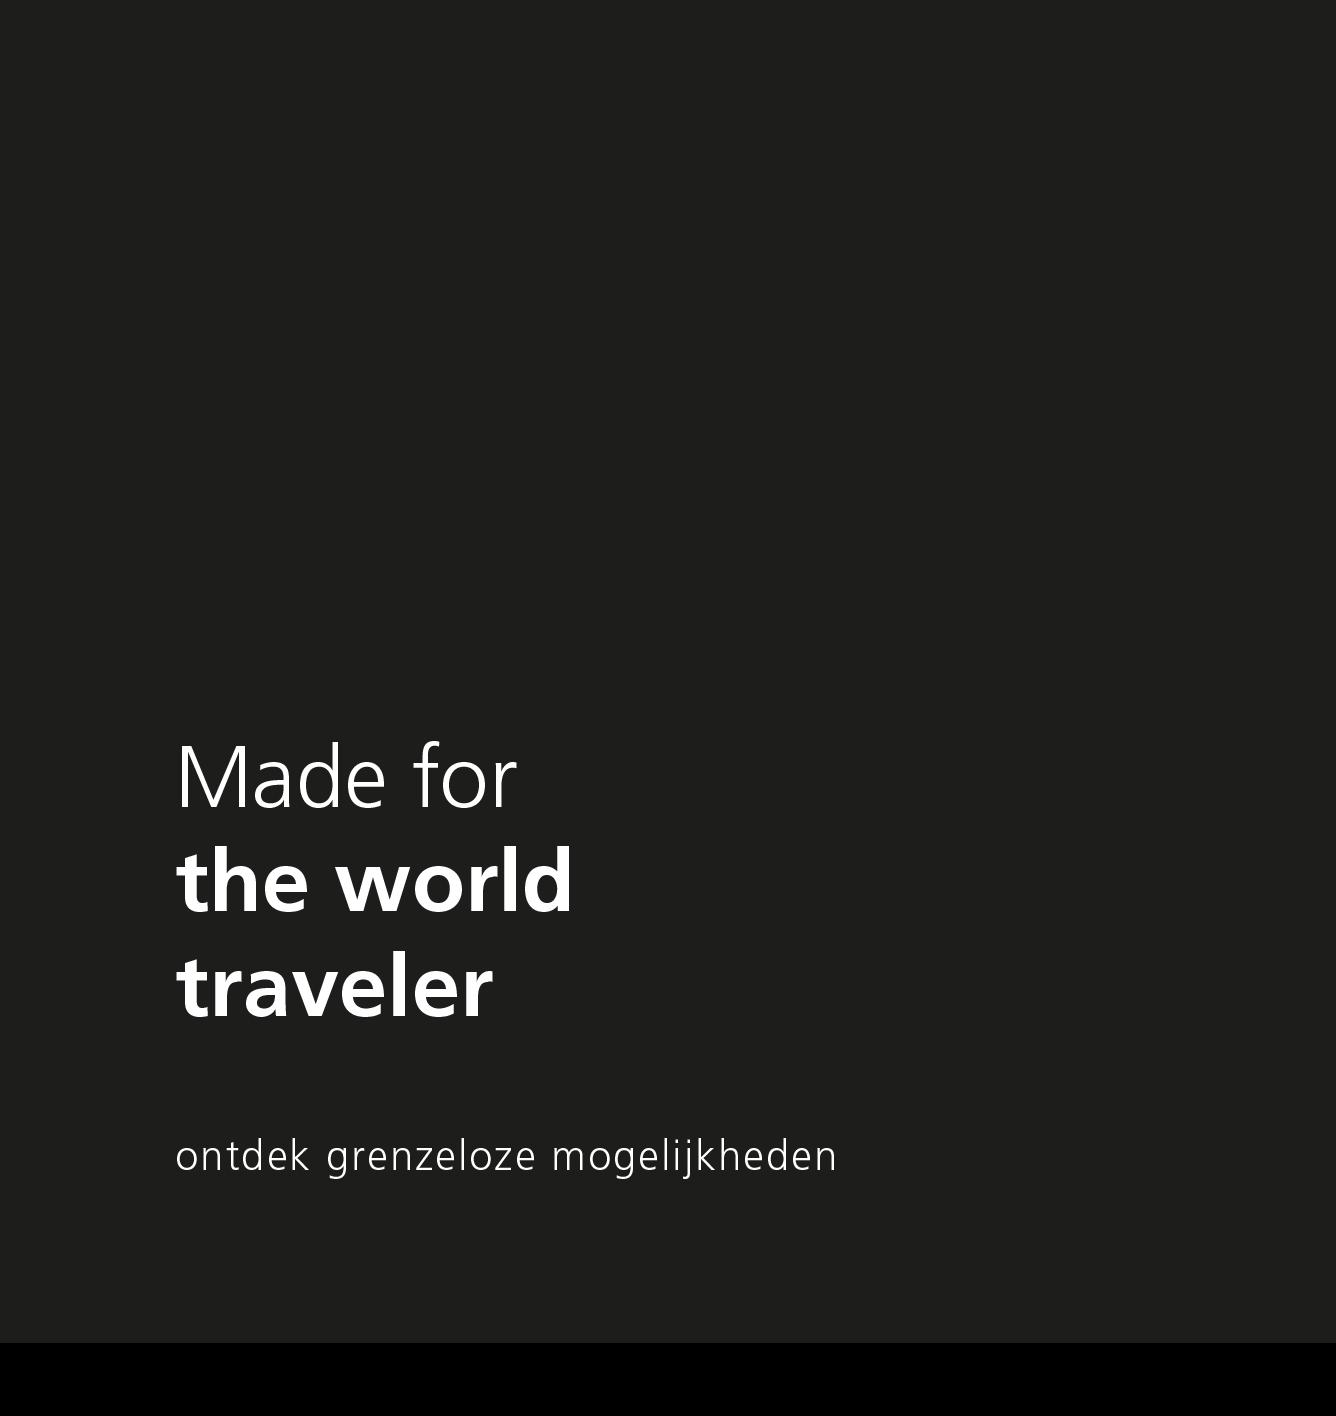 Made for the world traveler. Ontdek grenzeloze mogelijkheden.